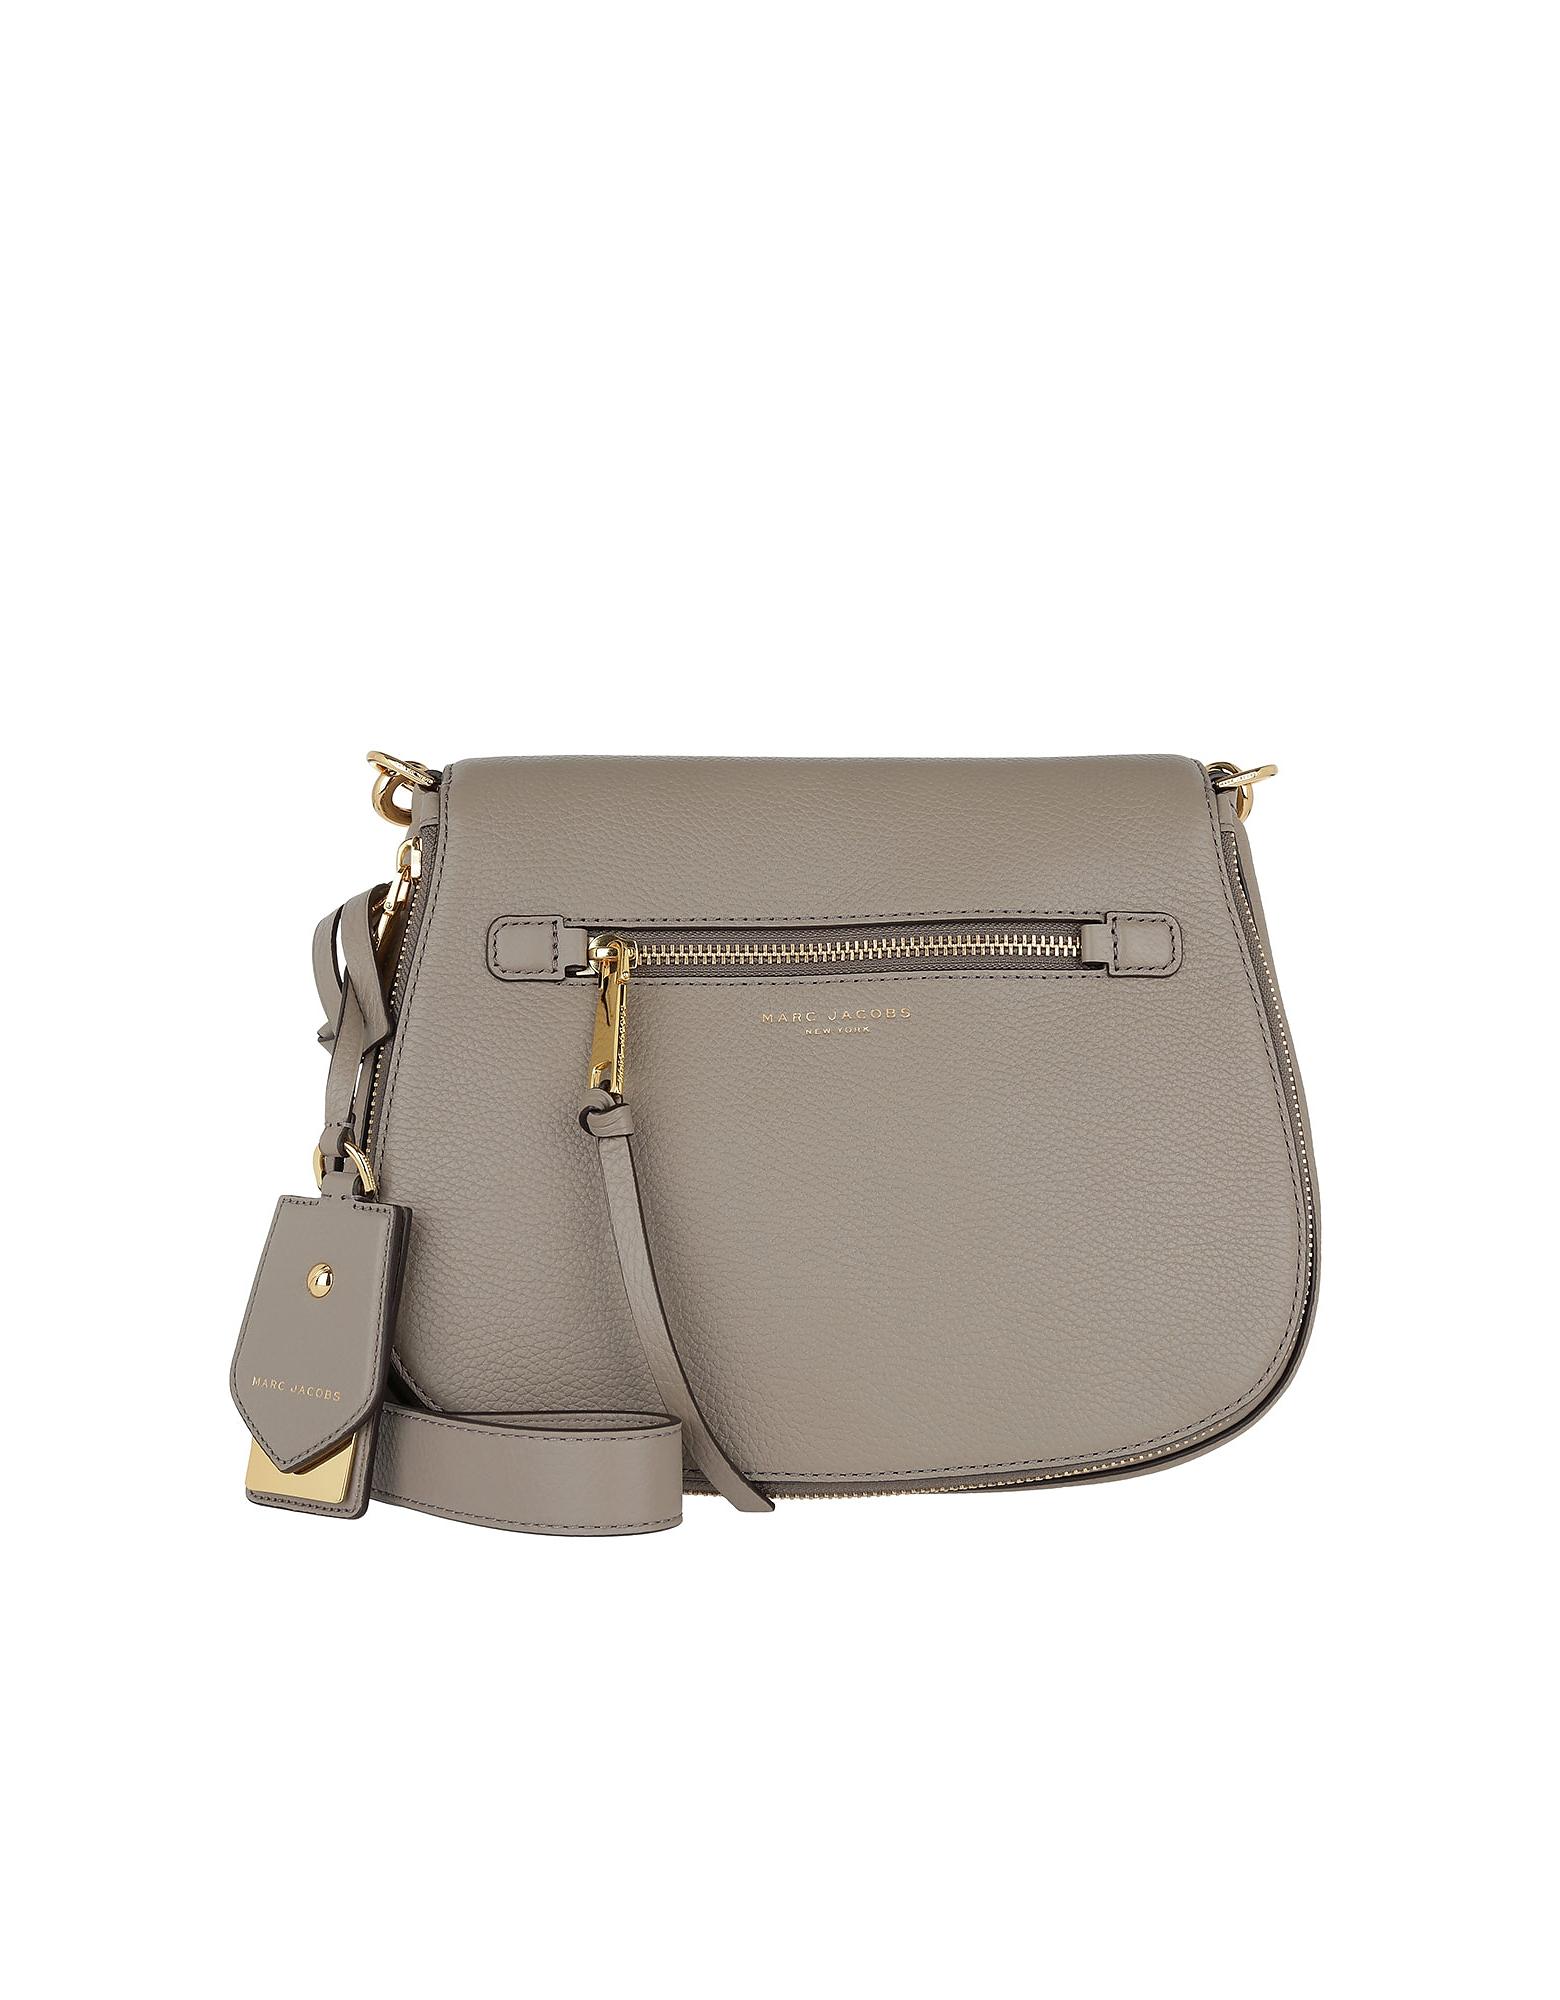 e5e7cddffe Marc Jacobs Recruit Saddle Bag Leather Mink | ModeSens